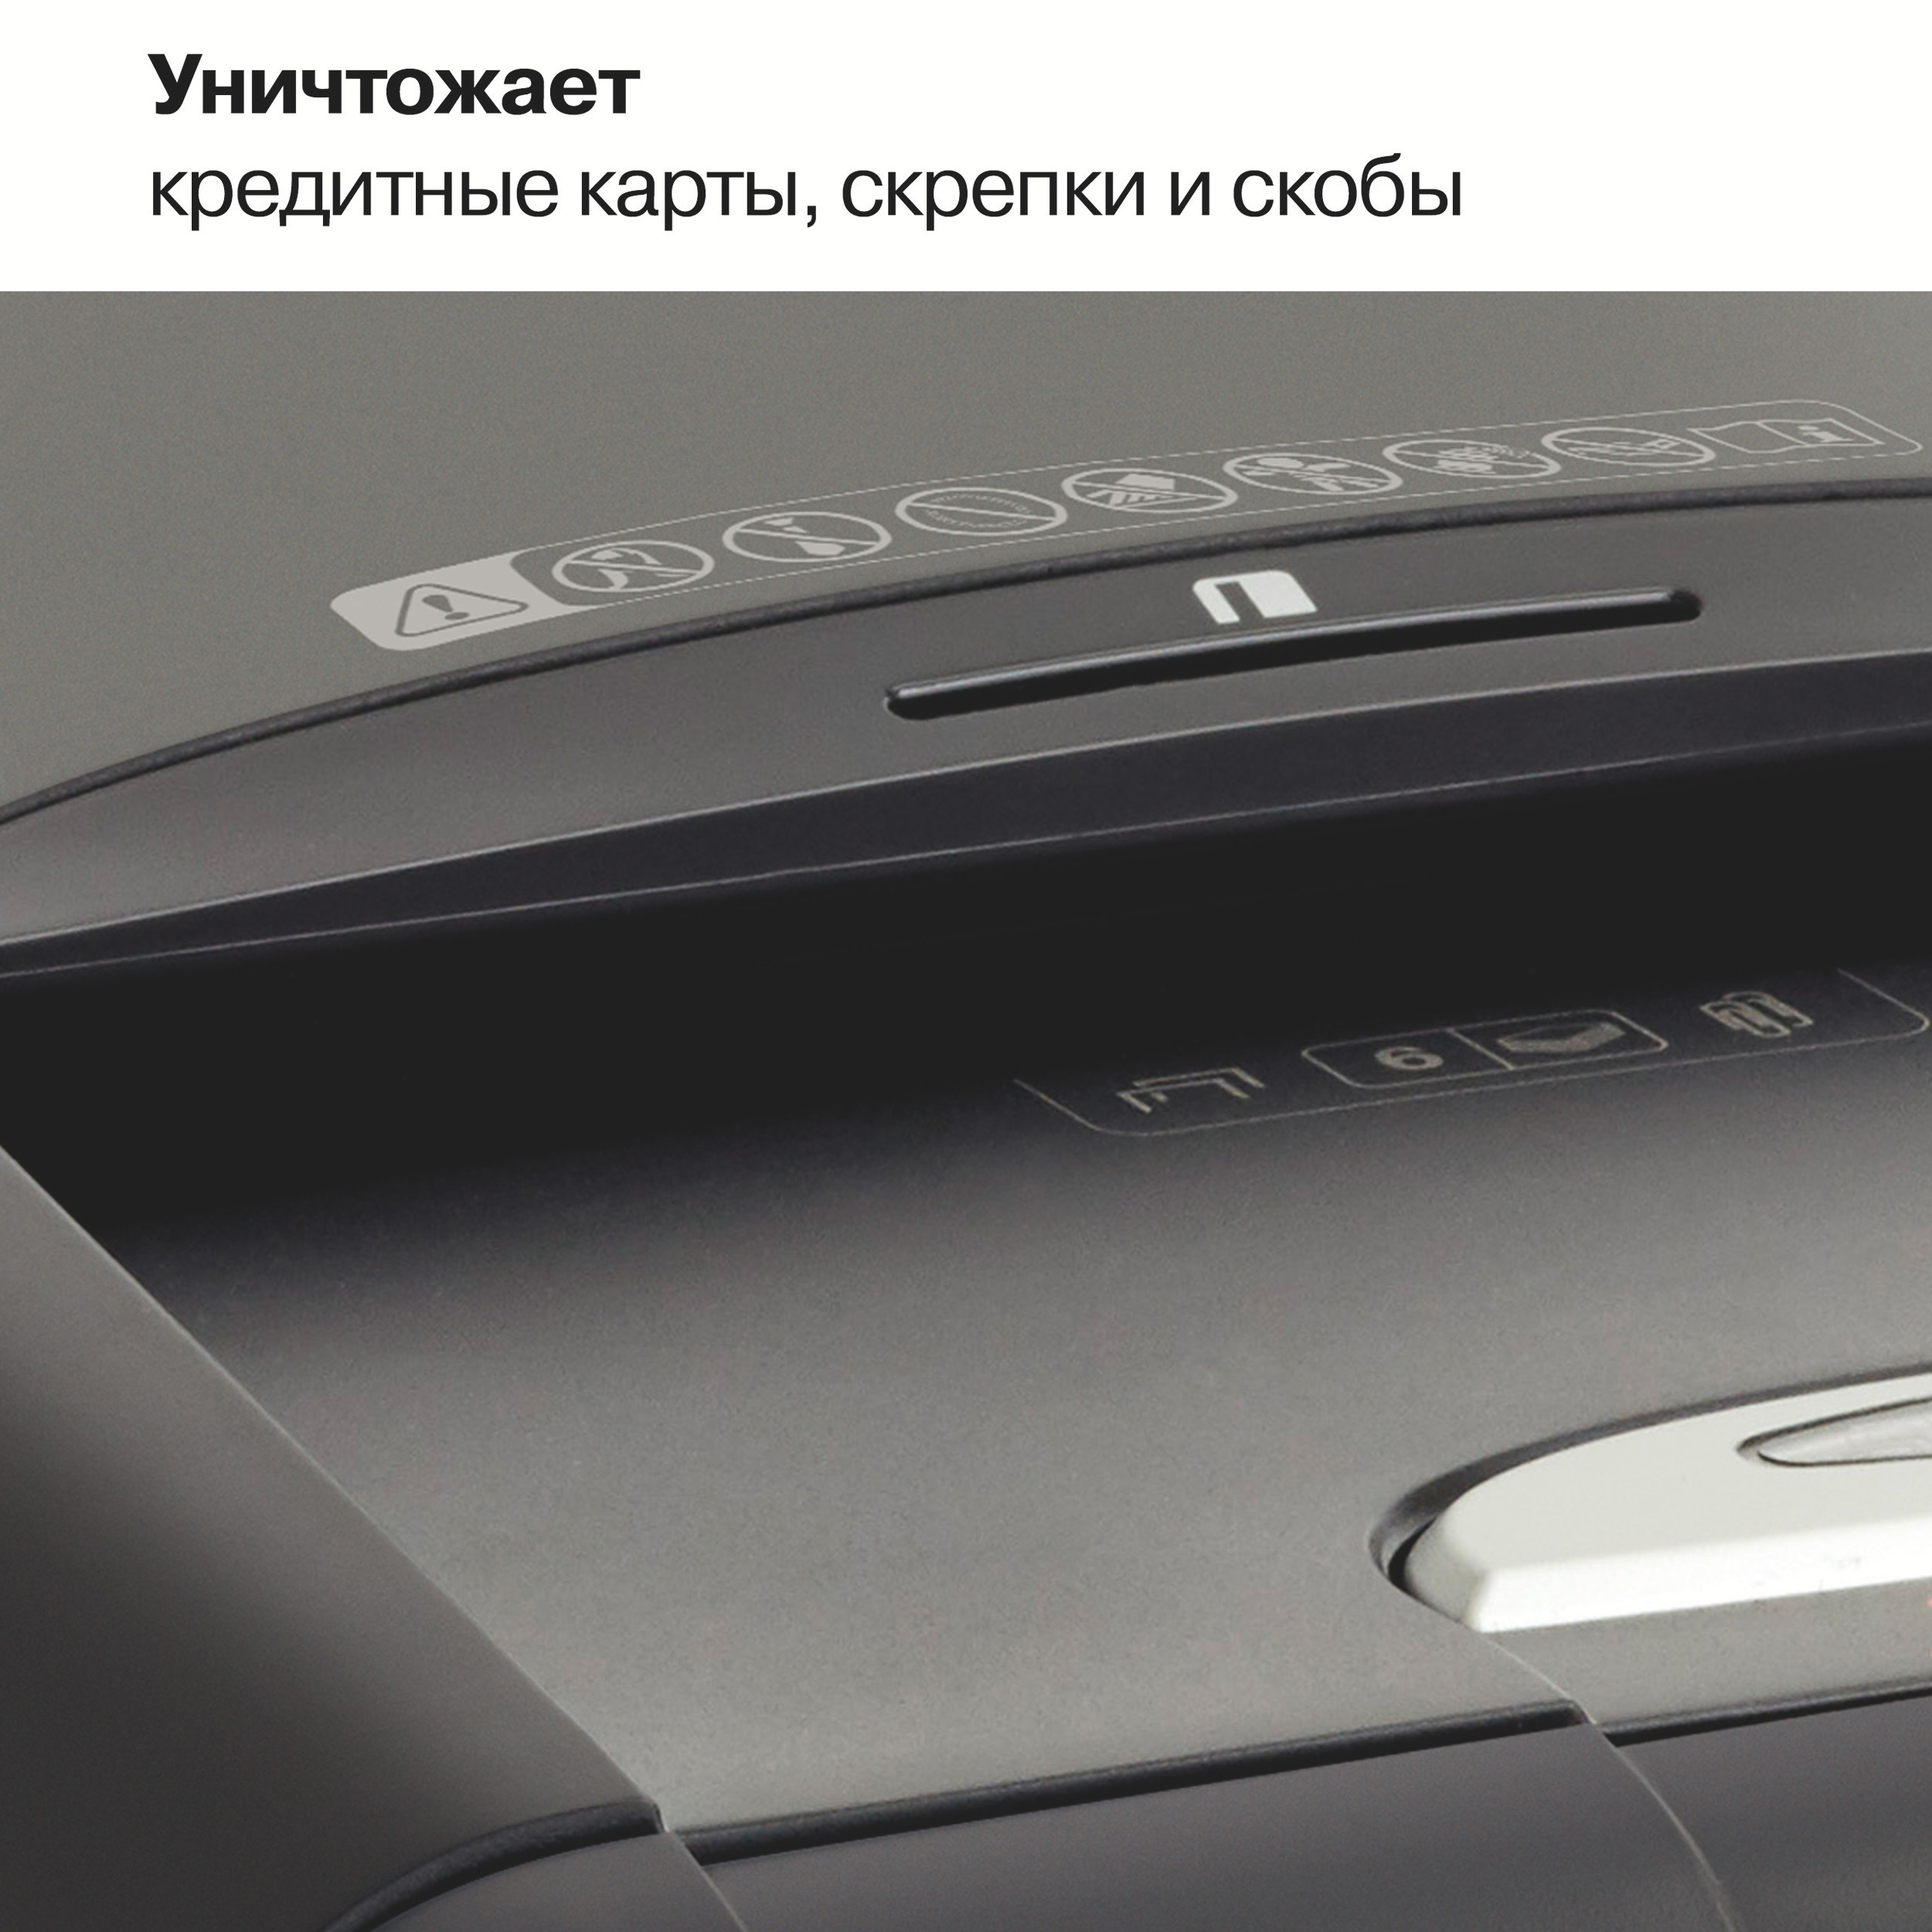 Уничтожитель документов Auto+130X. P4 6лист.,перекрестная резка, корзина 26л Rexel - фото 11